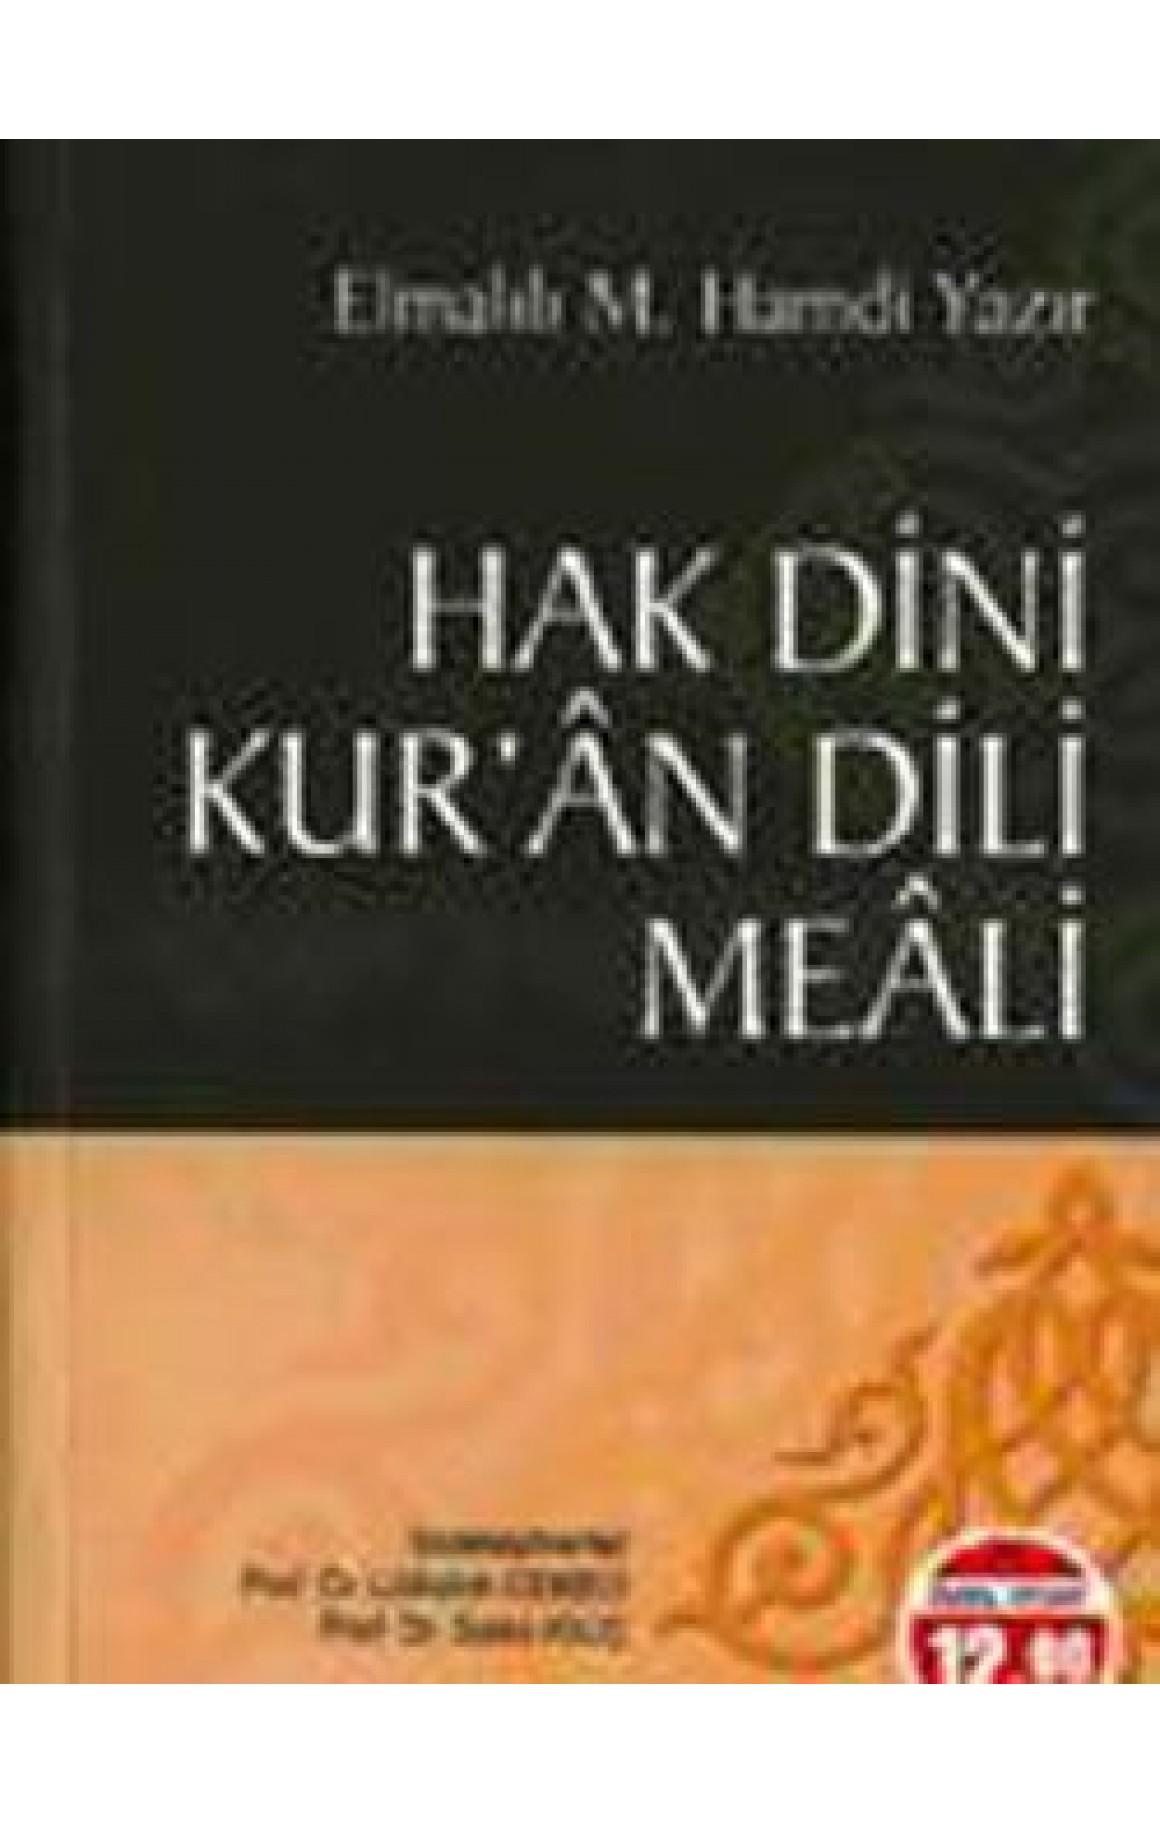 Hak Dini Kuran Dili Meali